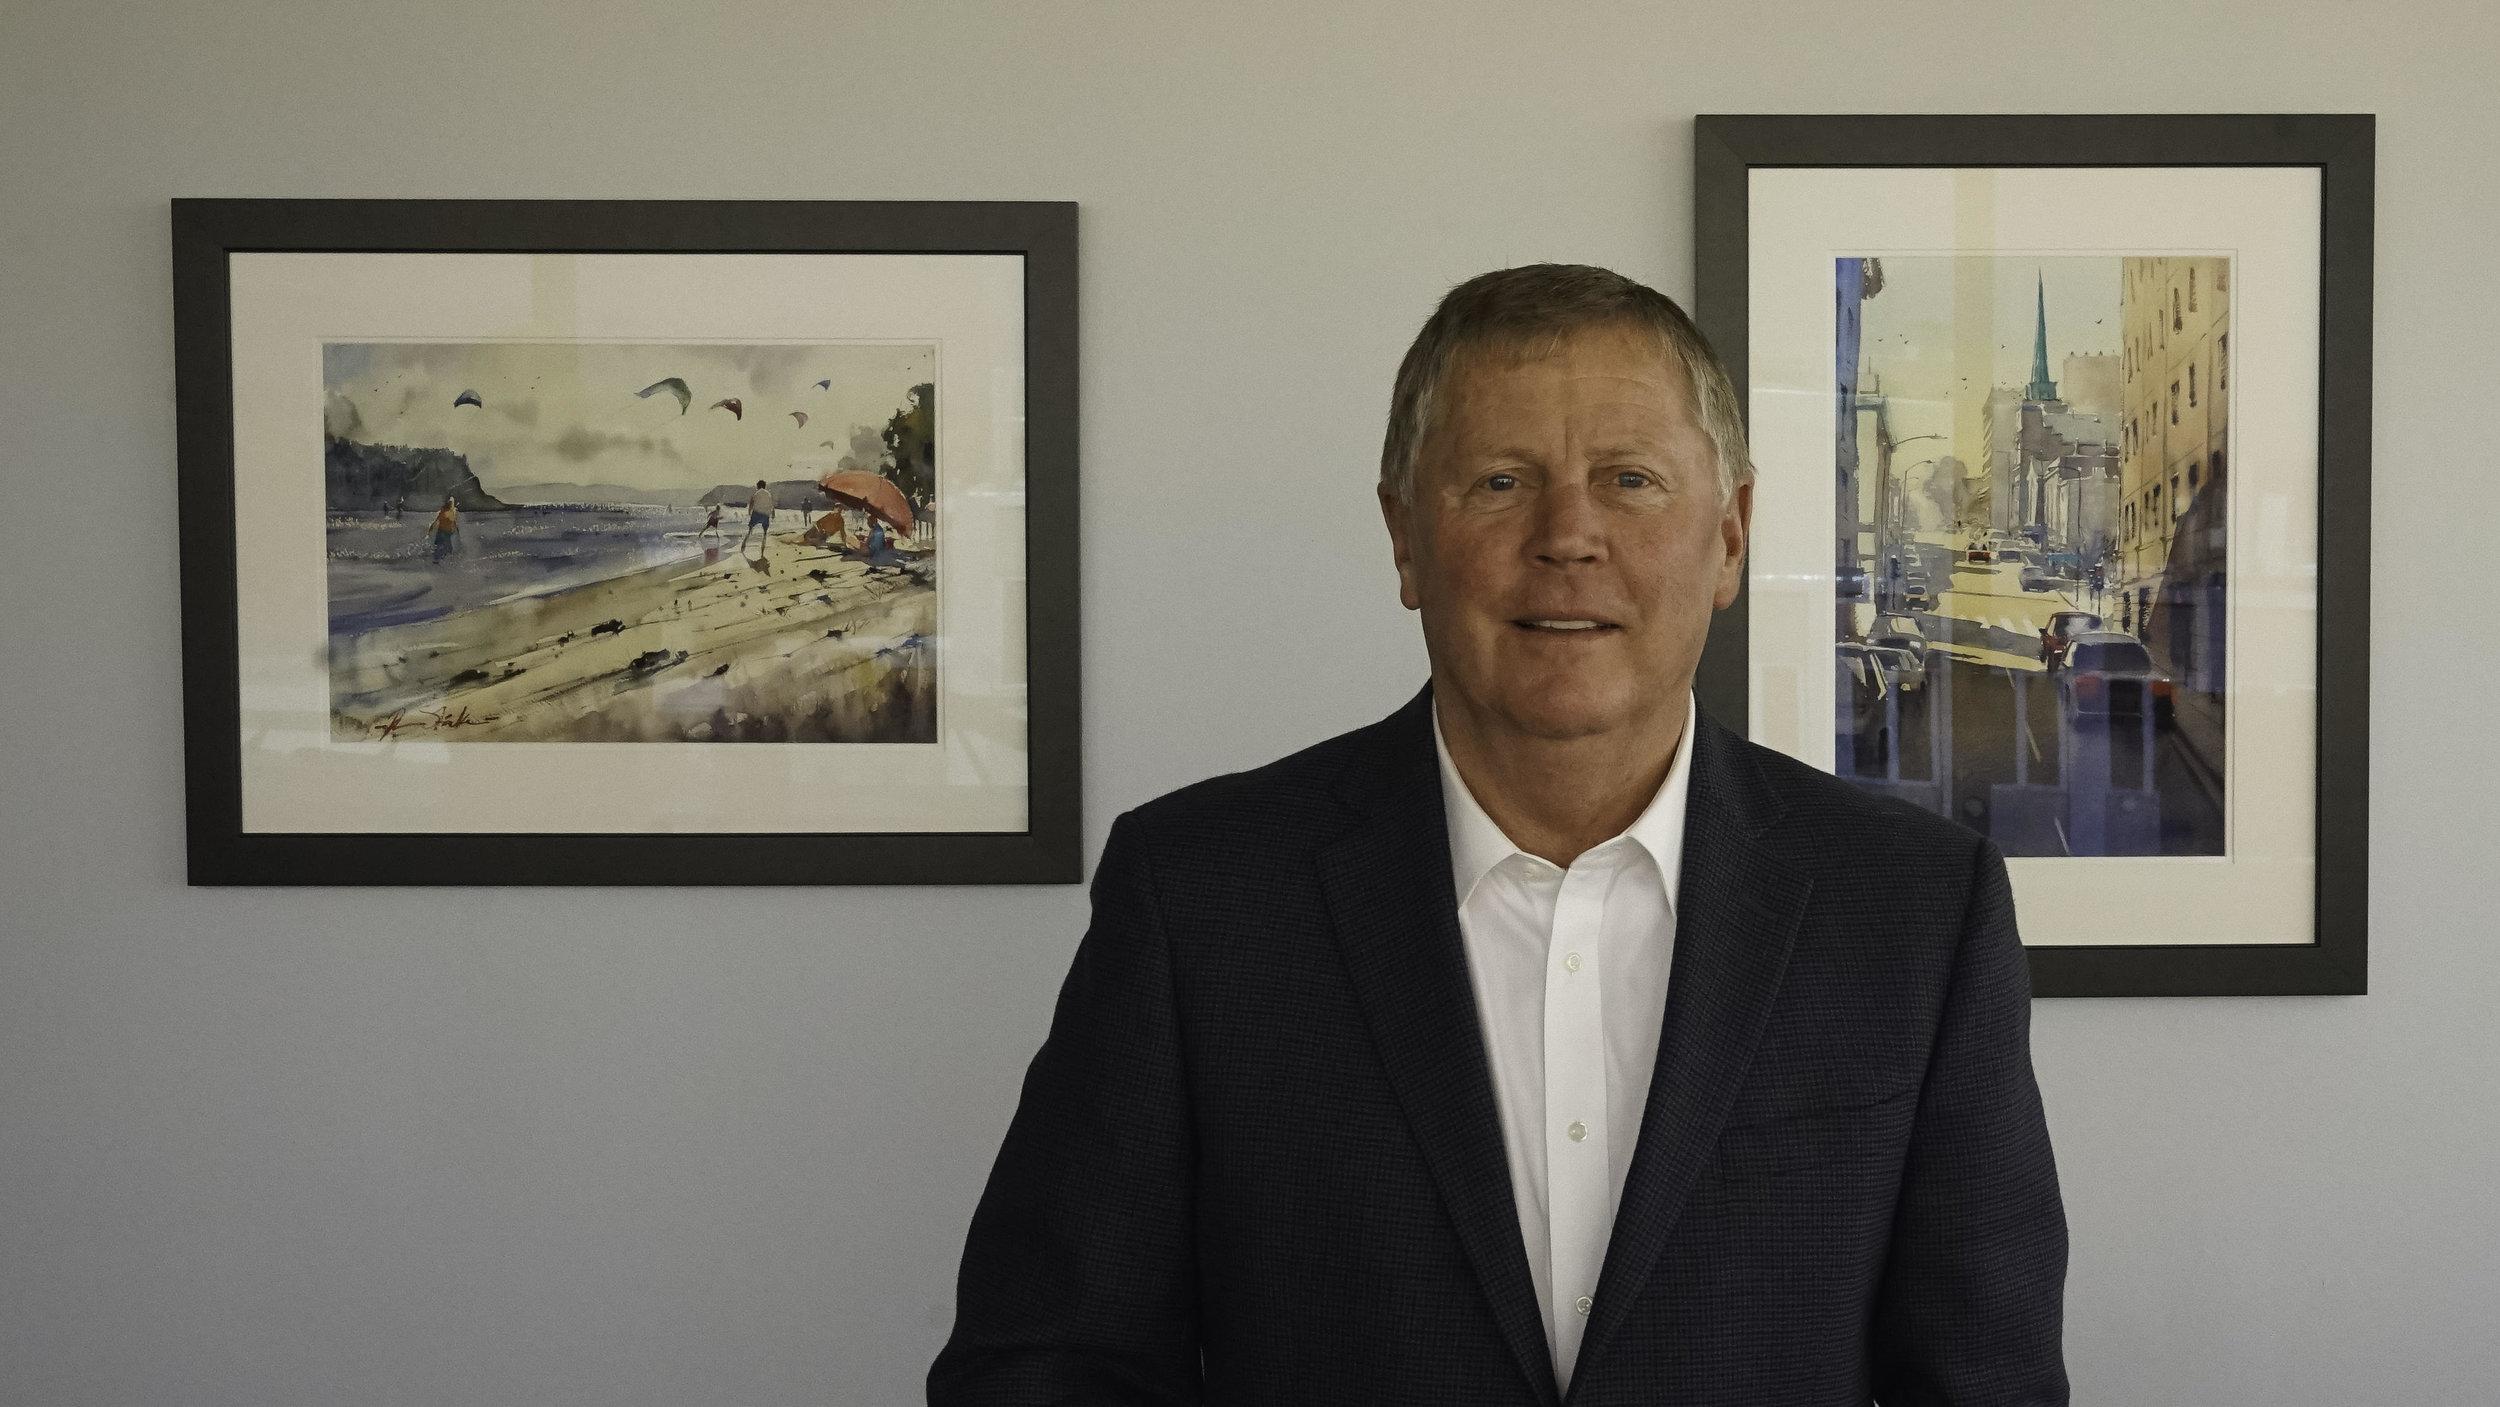 Mayor Ray Stephanson